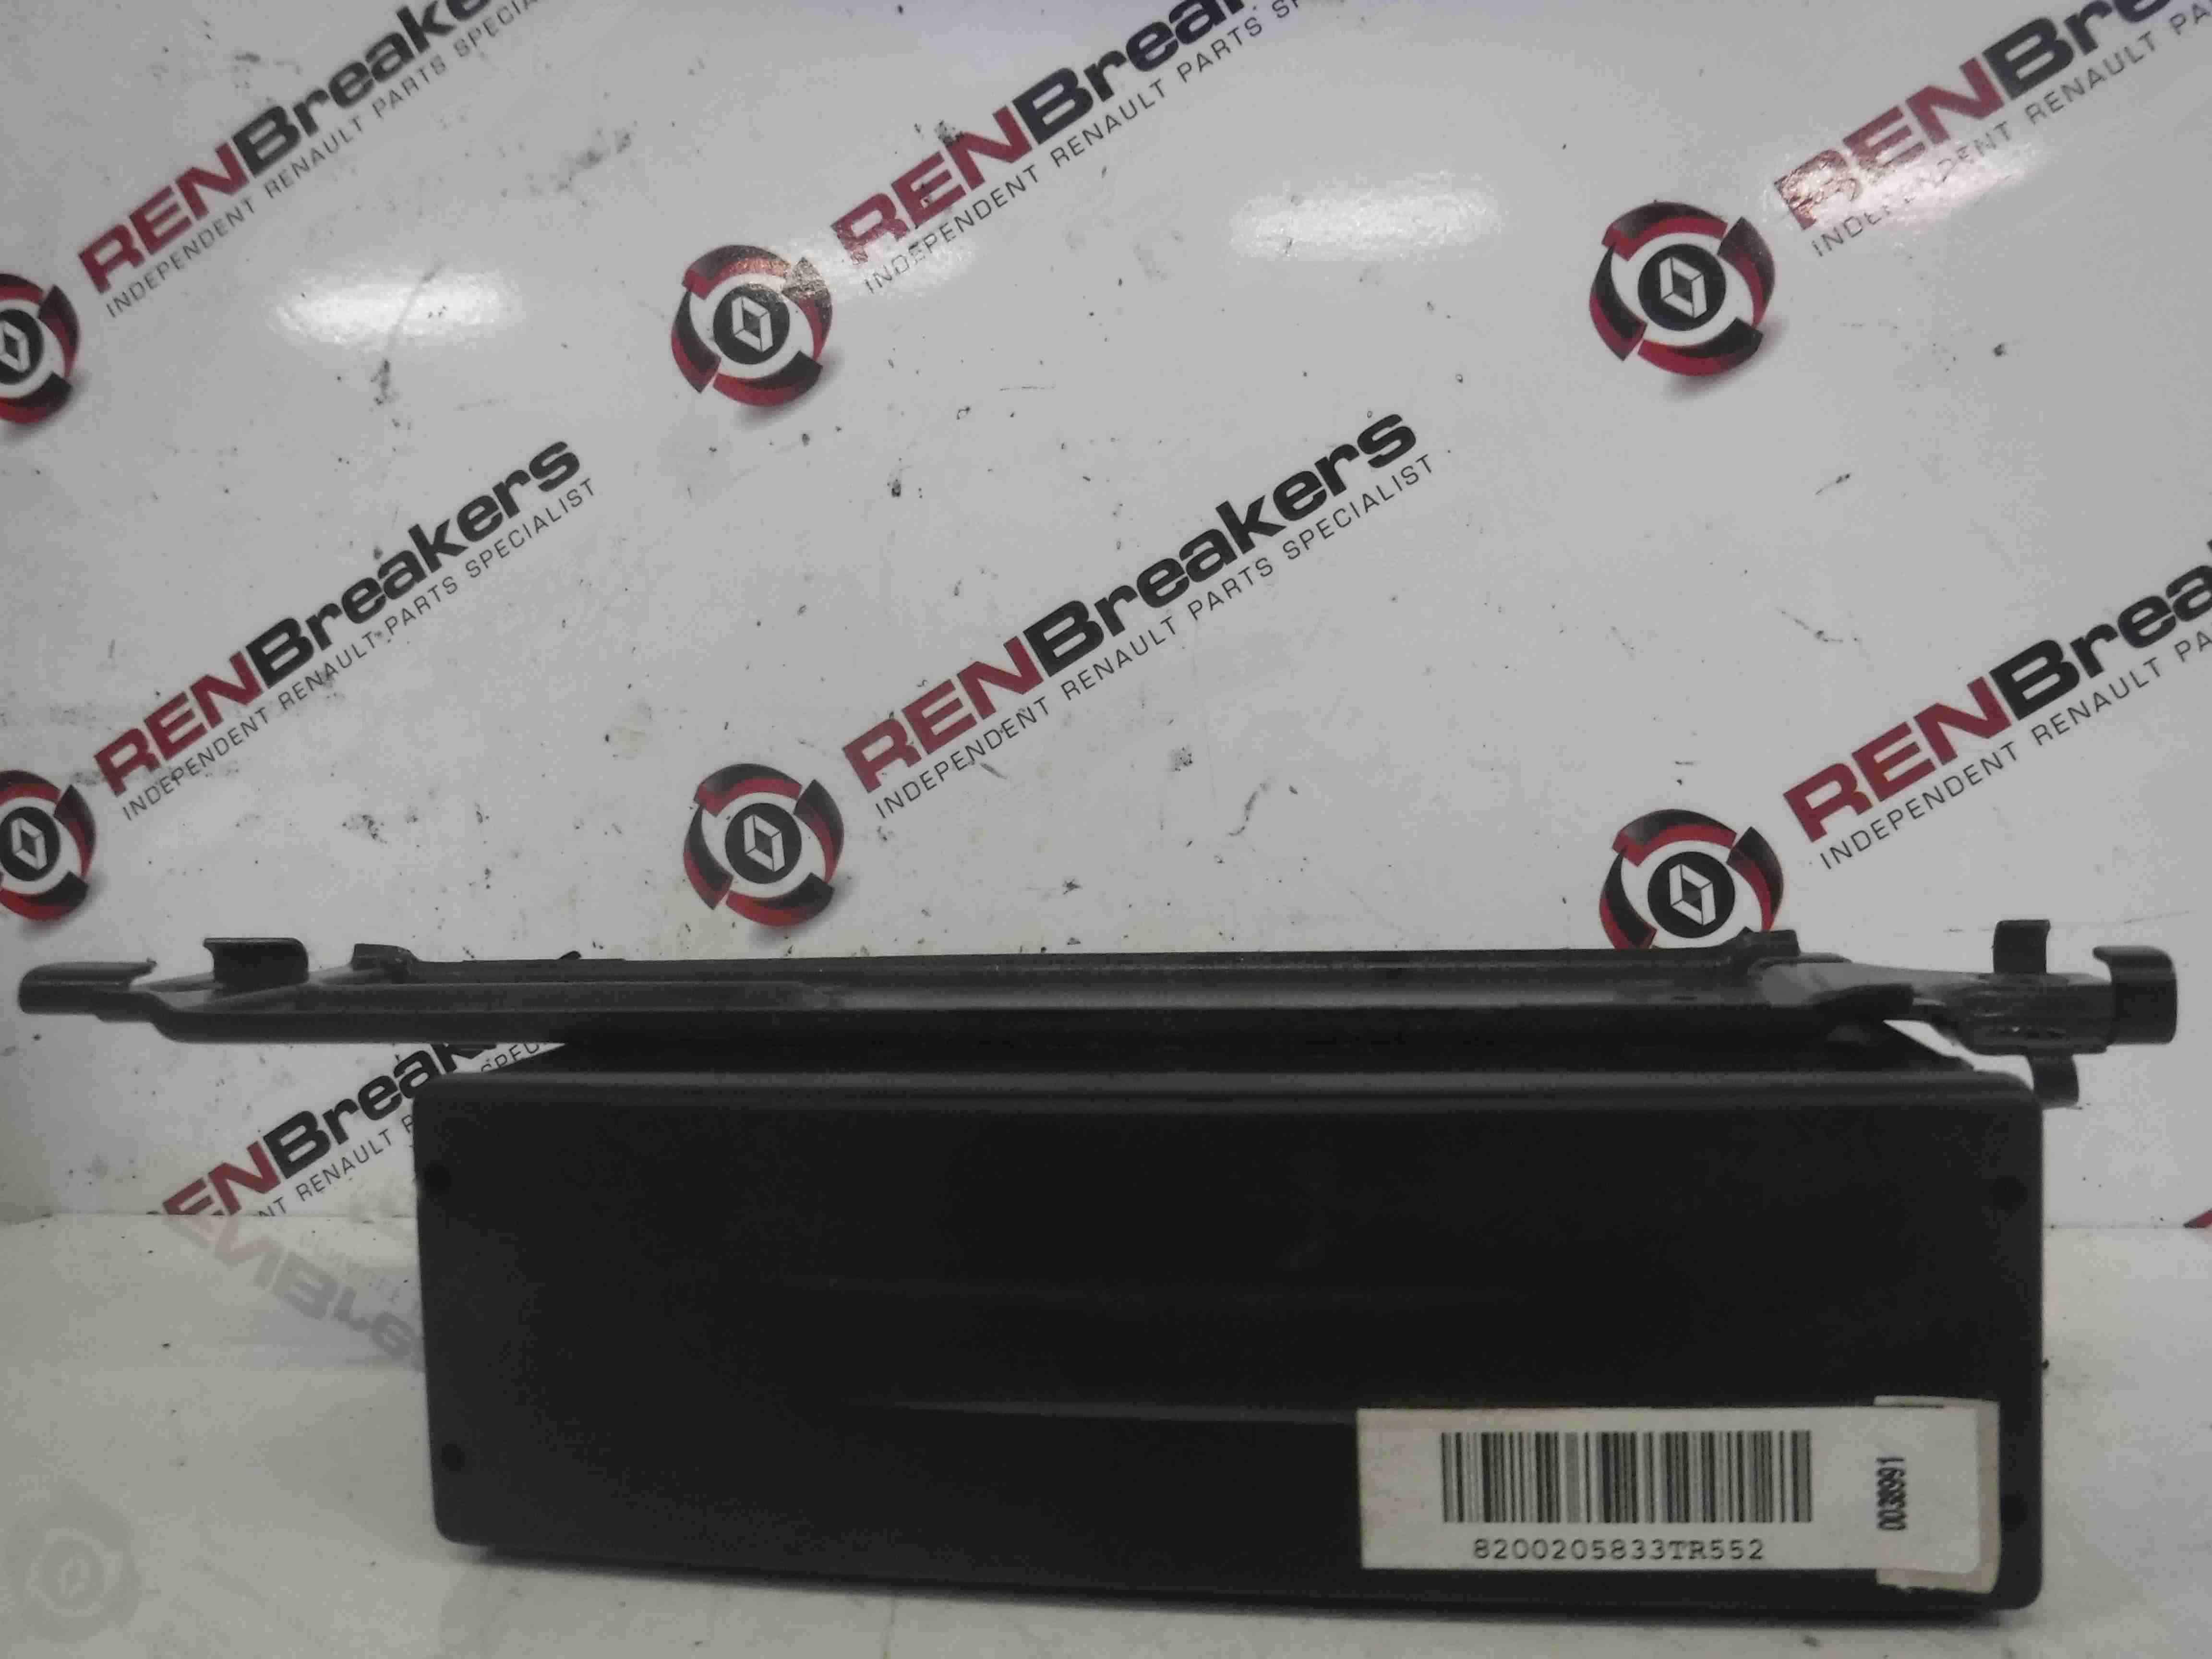 Renault Espace 2003-2013 Radio Tuner Amplifier 8200205833